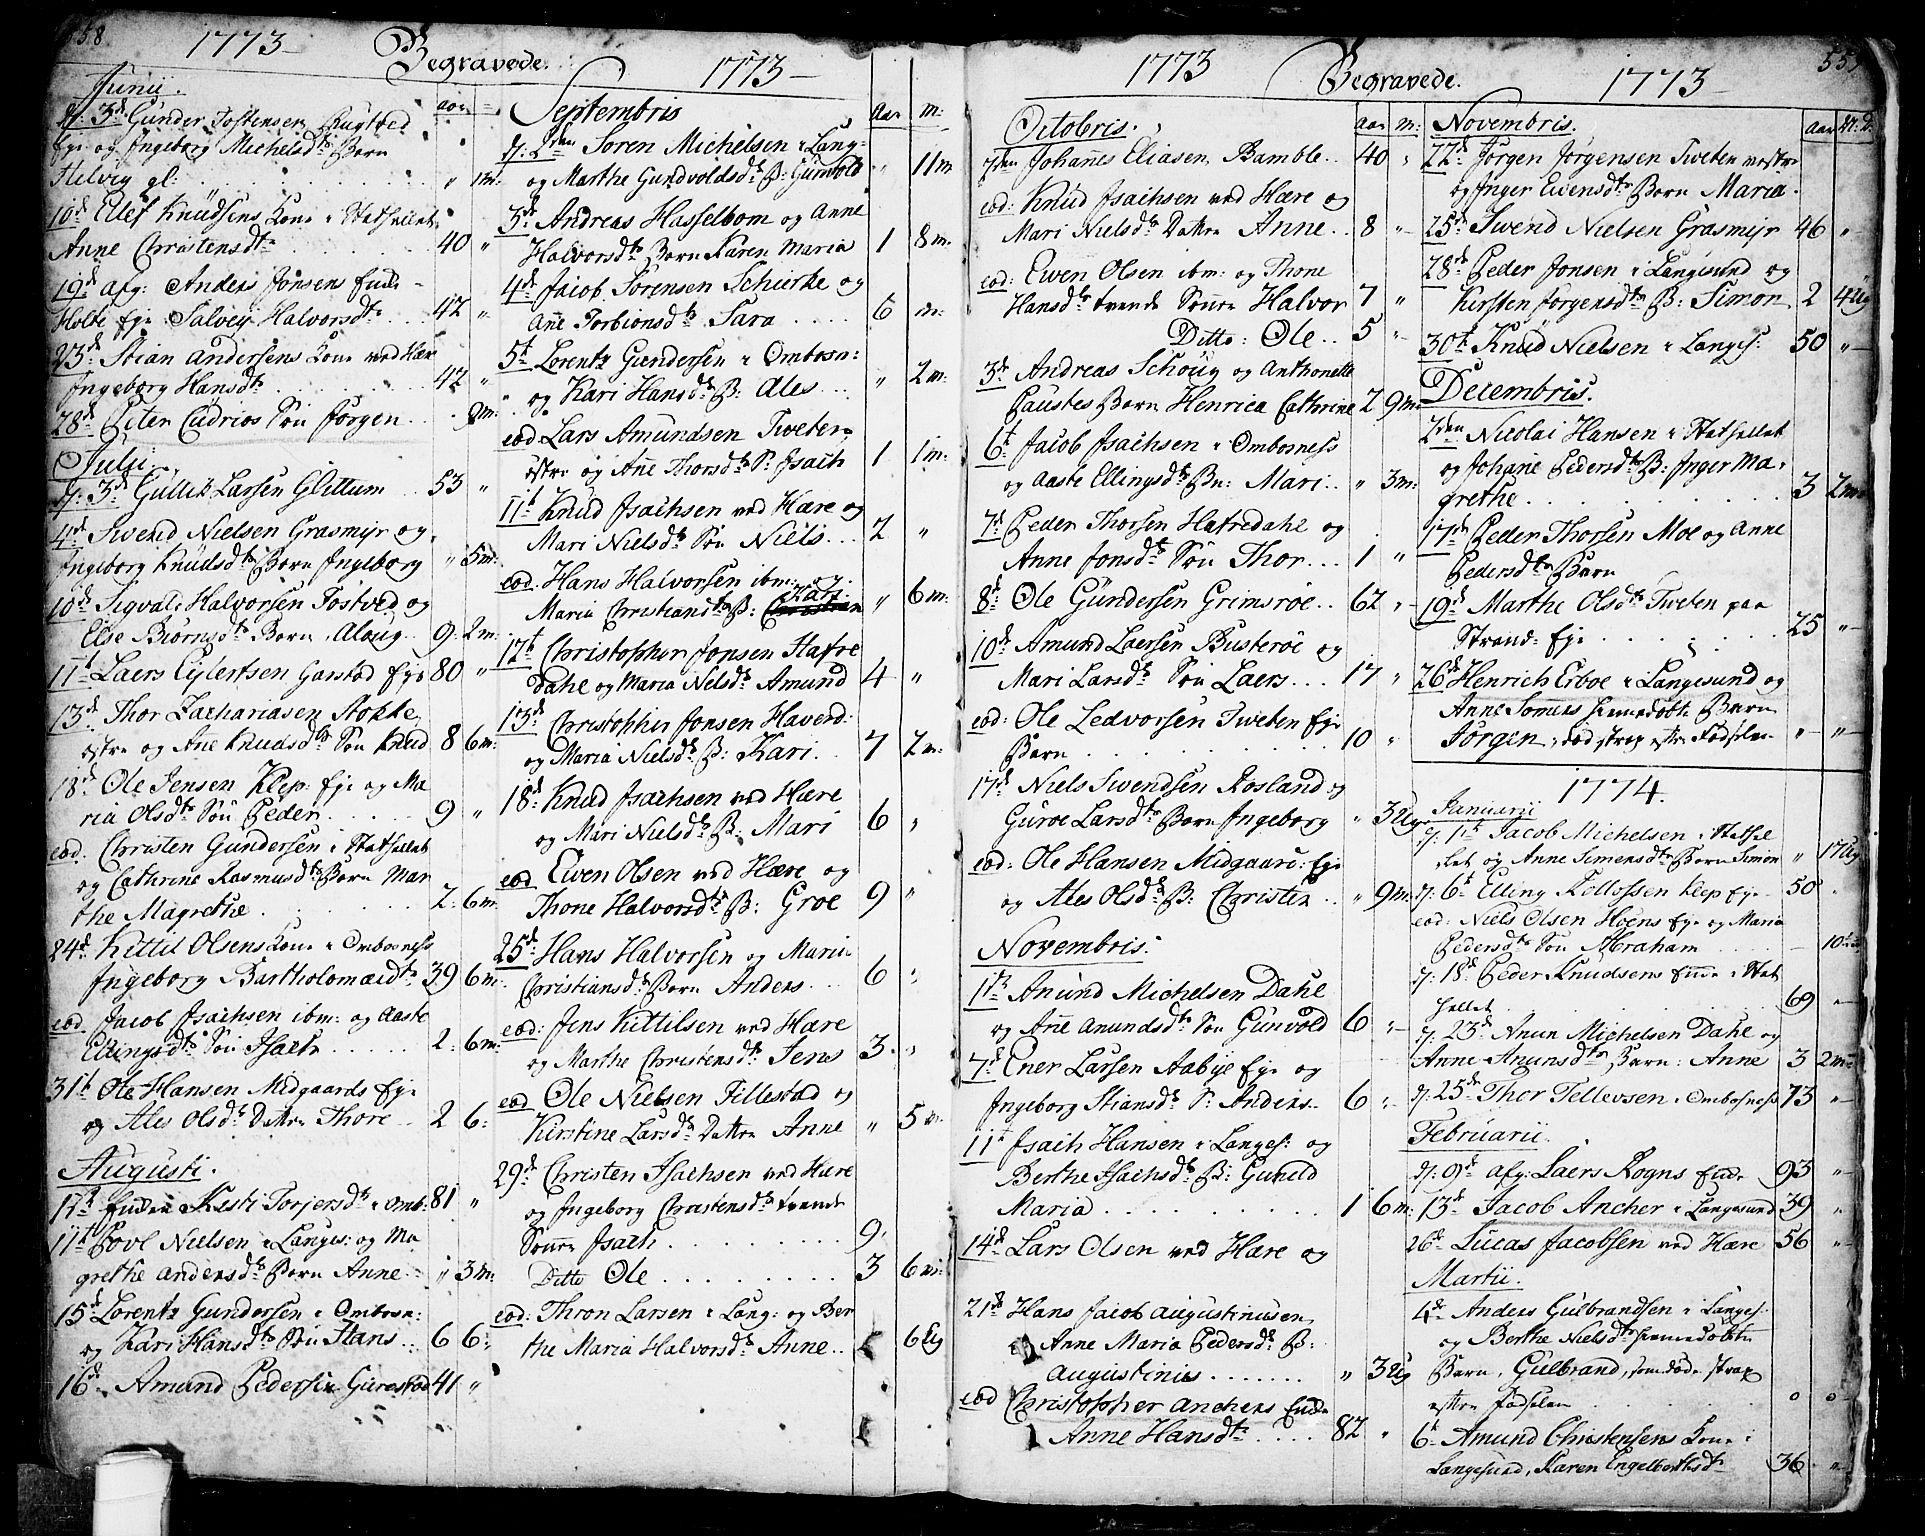 SAKO, Bamble kirkebøker, F/Fa/L0001: Ministerialbok nr. I 1, 1702-1774, s. 558-559